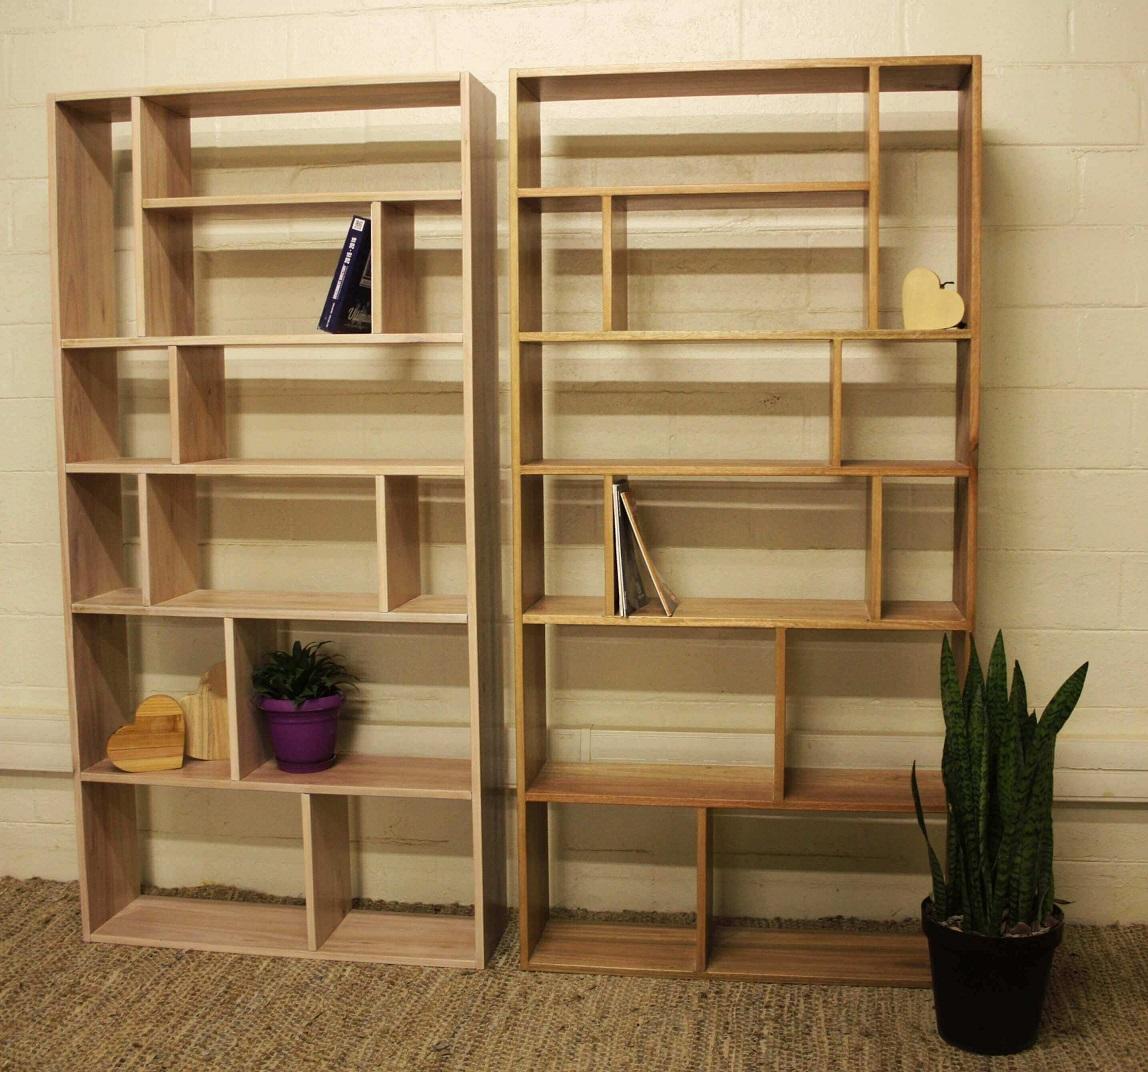 Foto de Eco Furniture Design - furniture supplier manufacturer & store South Africa Cape Town